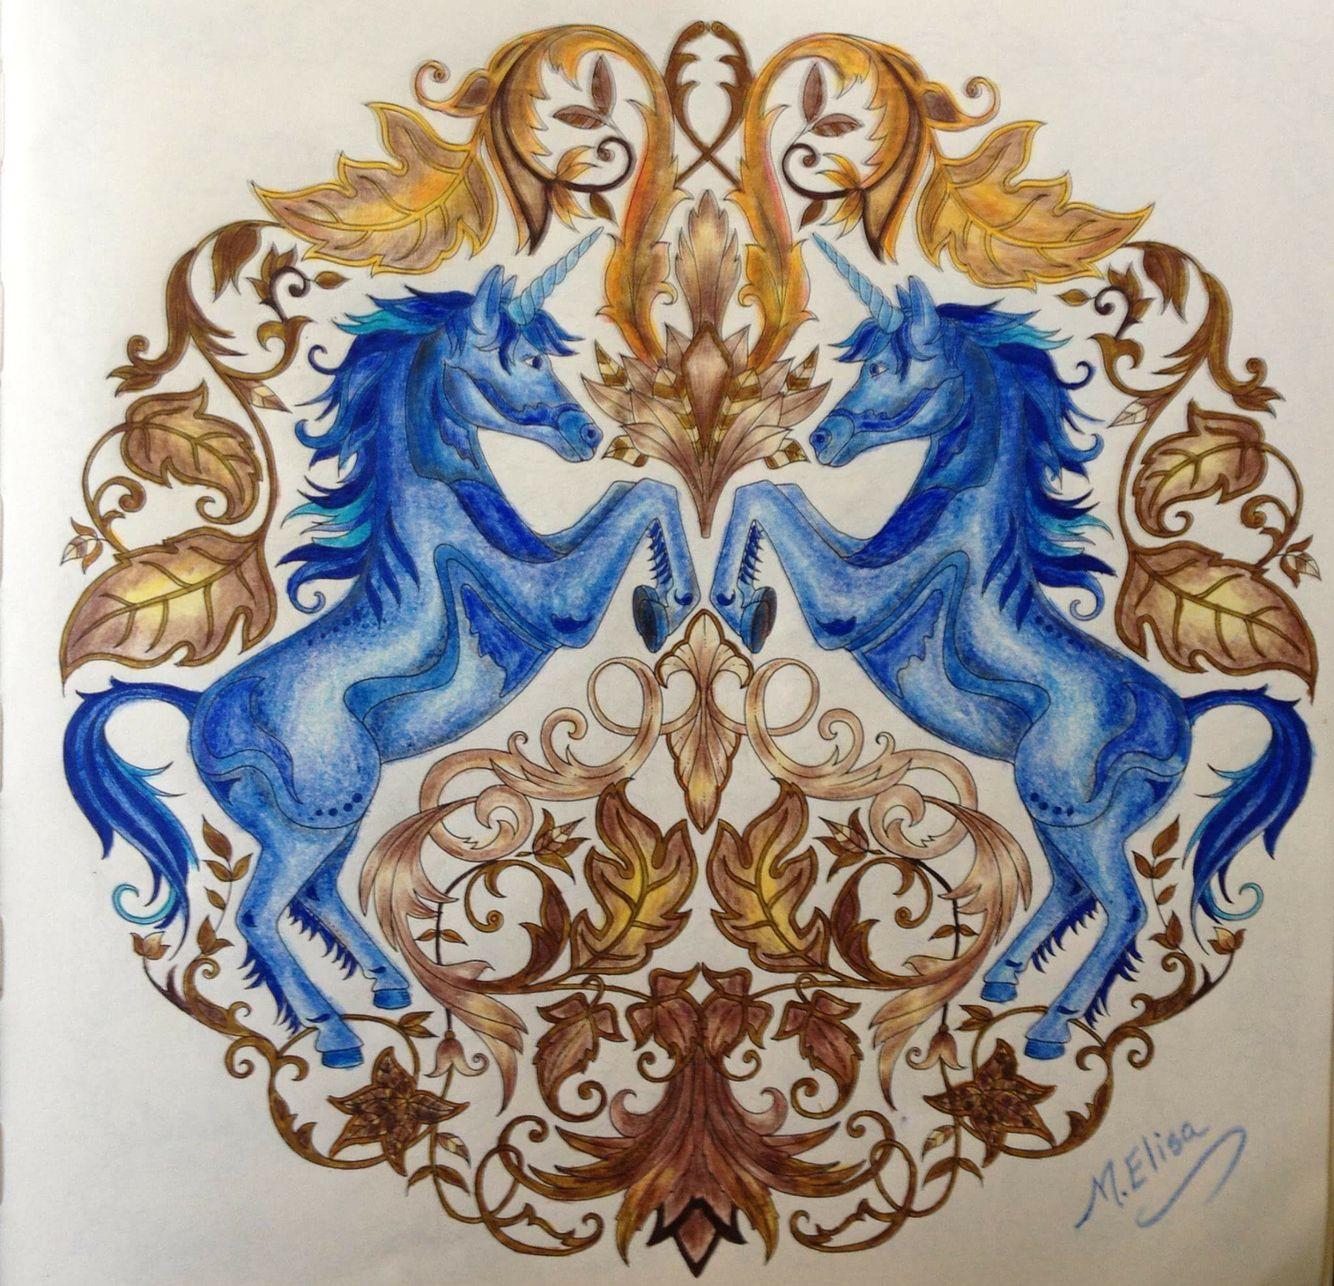 Johanna Basford Coloring Book Unicorns Enchanted Forest Unicornios Floresta Encantada